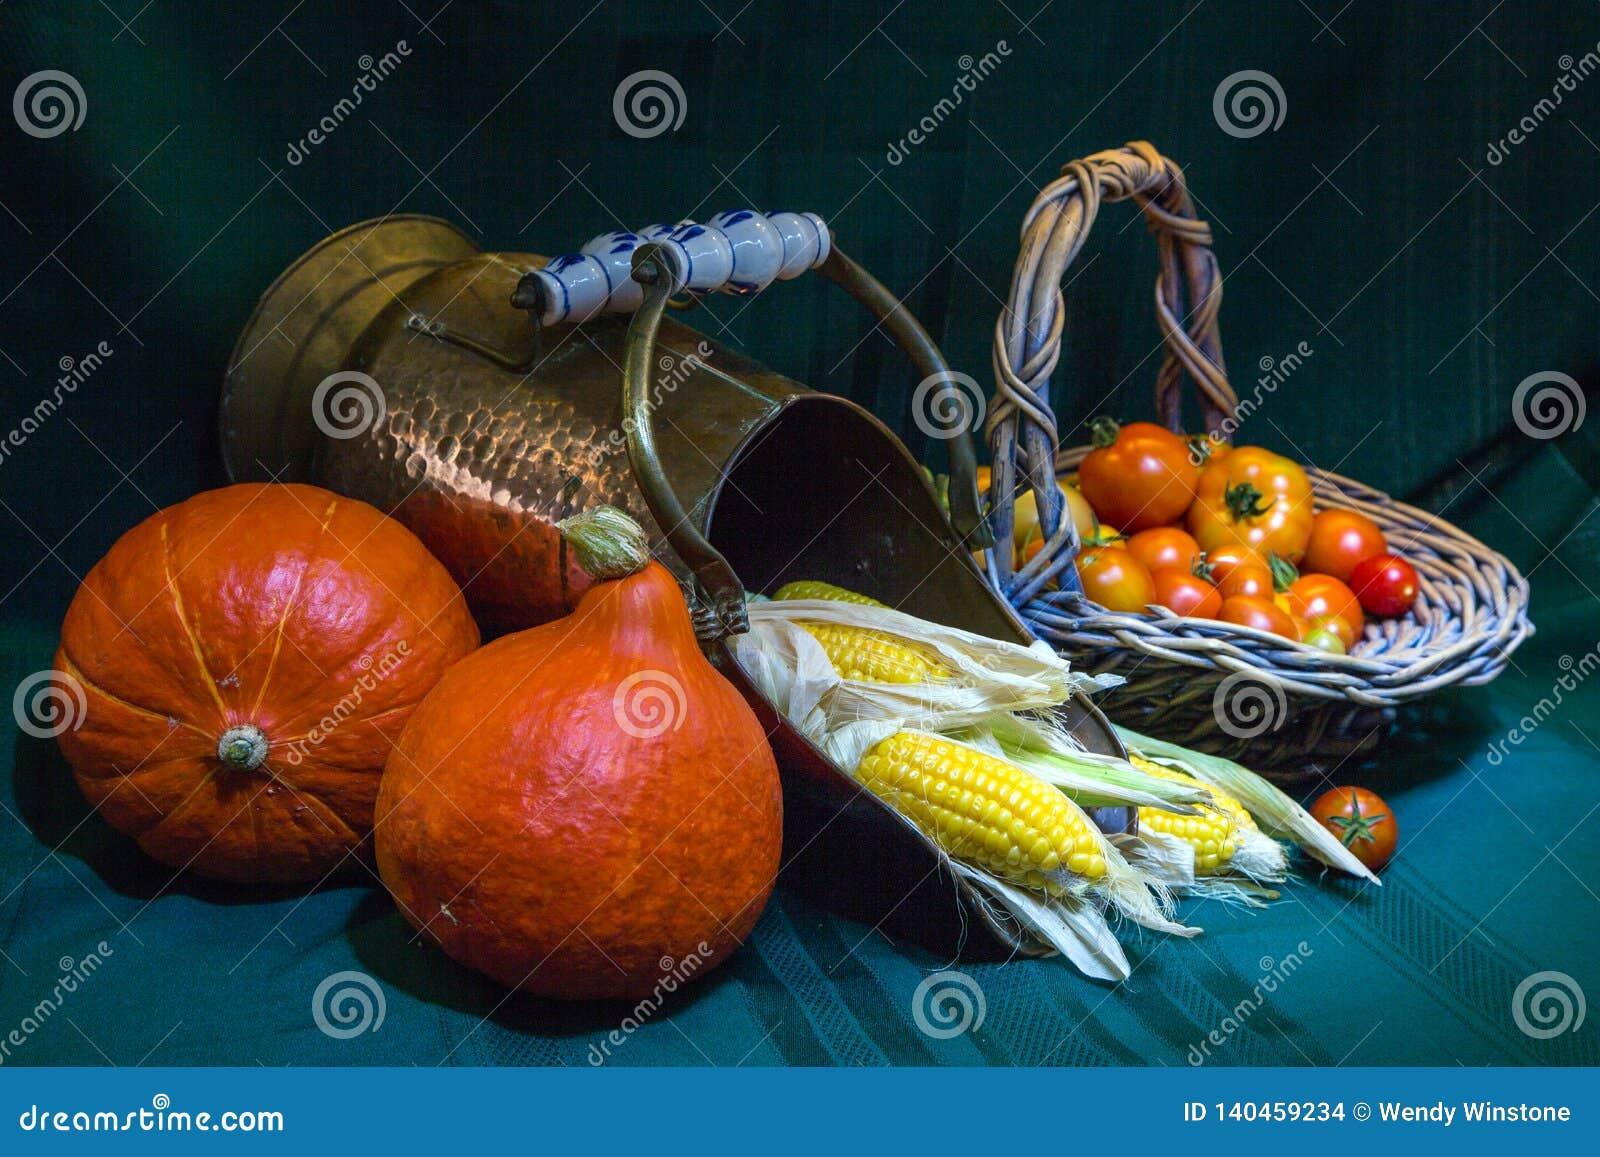 Potimarron Pumpkin with sweetcorn and tomatoe